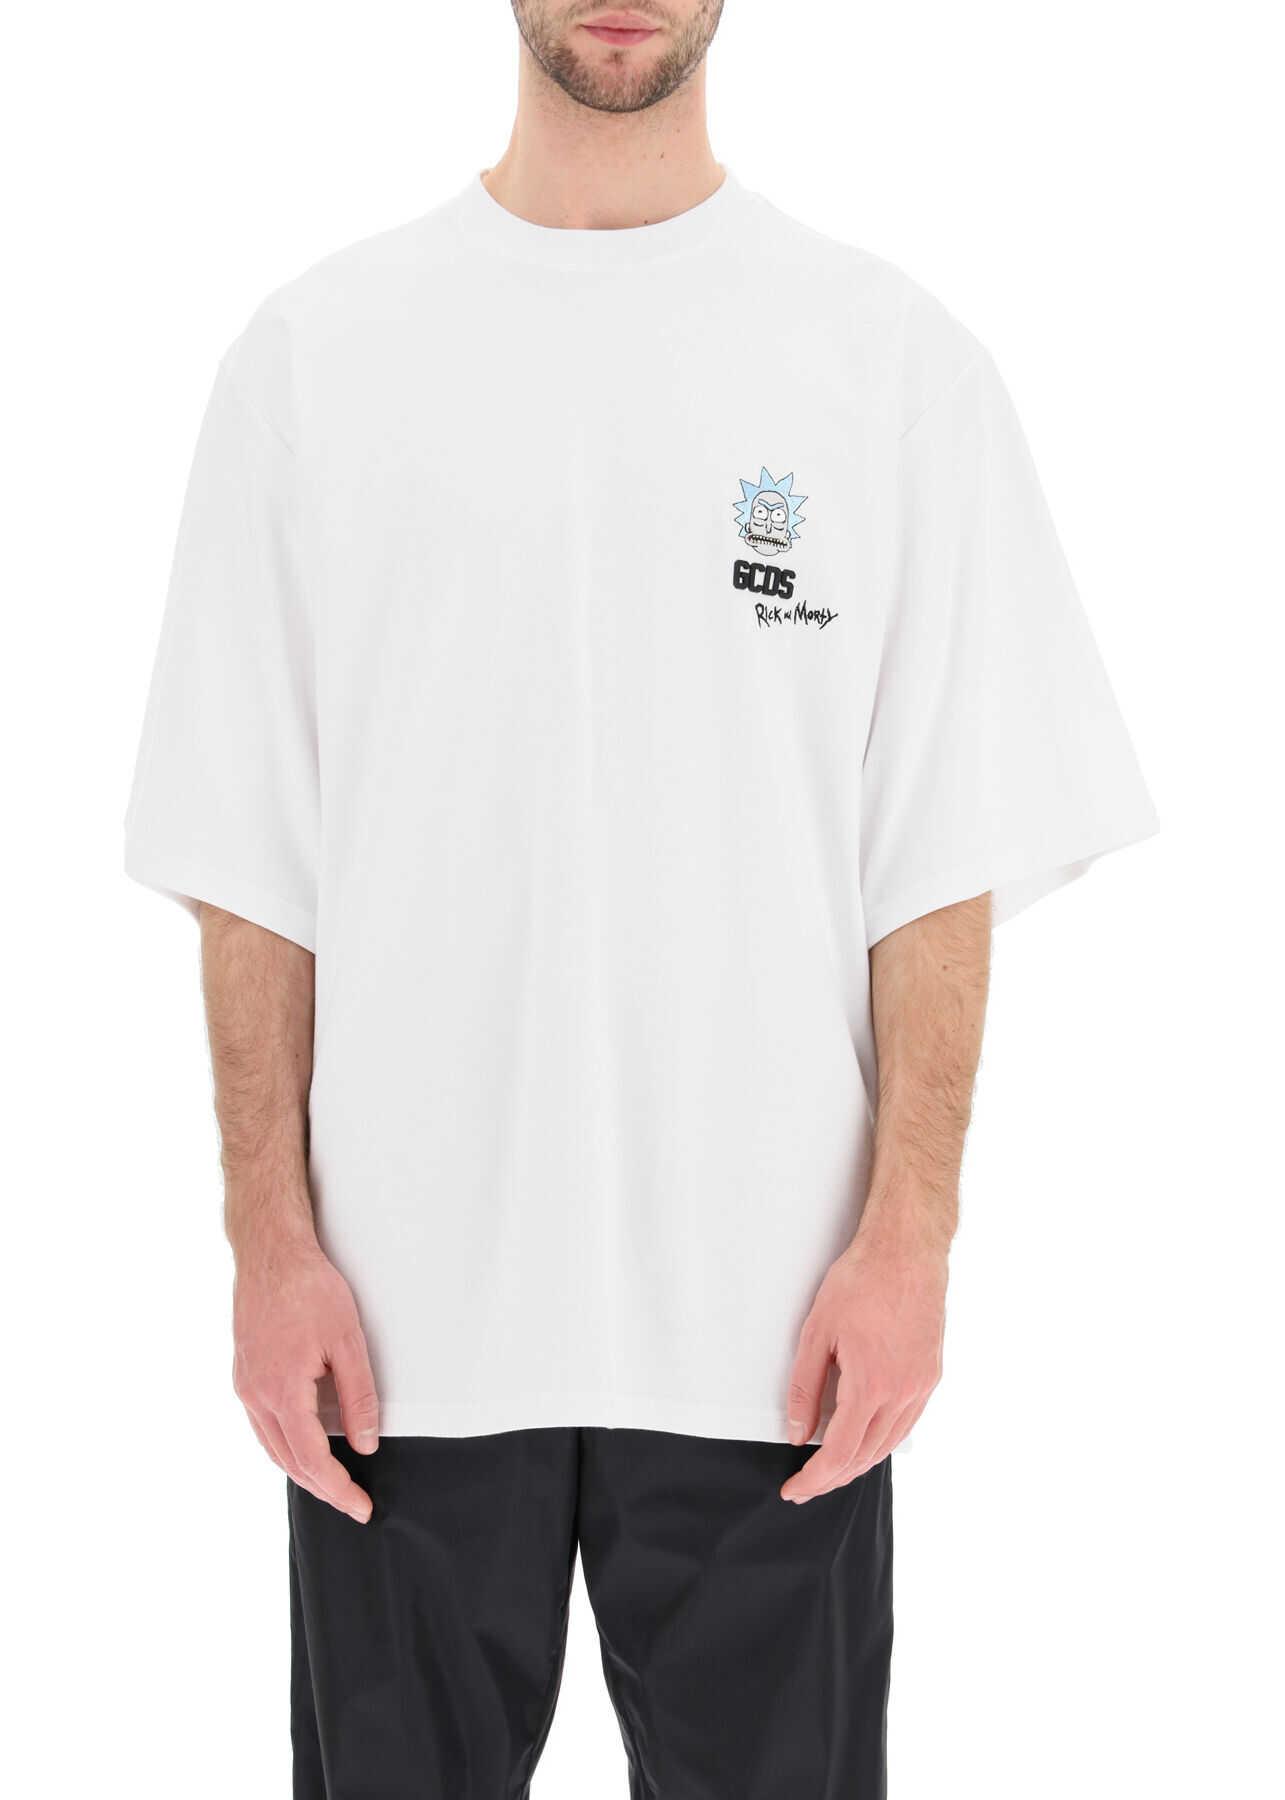 X Rick And Morty T-Shirt